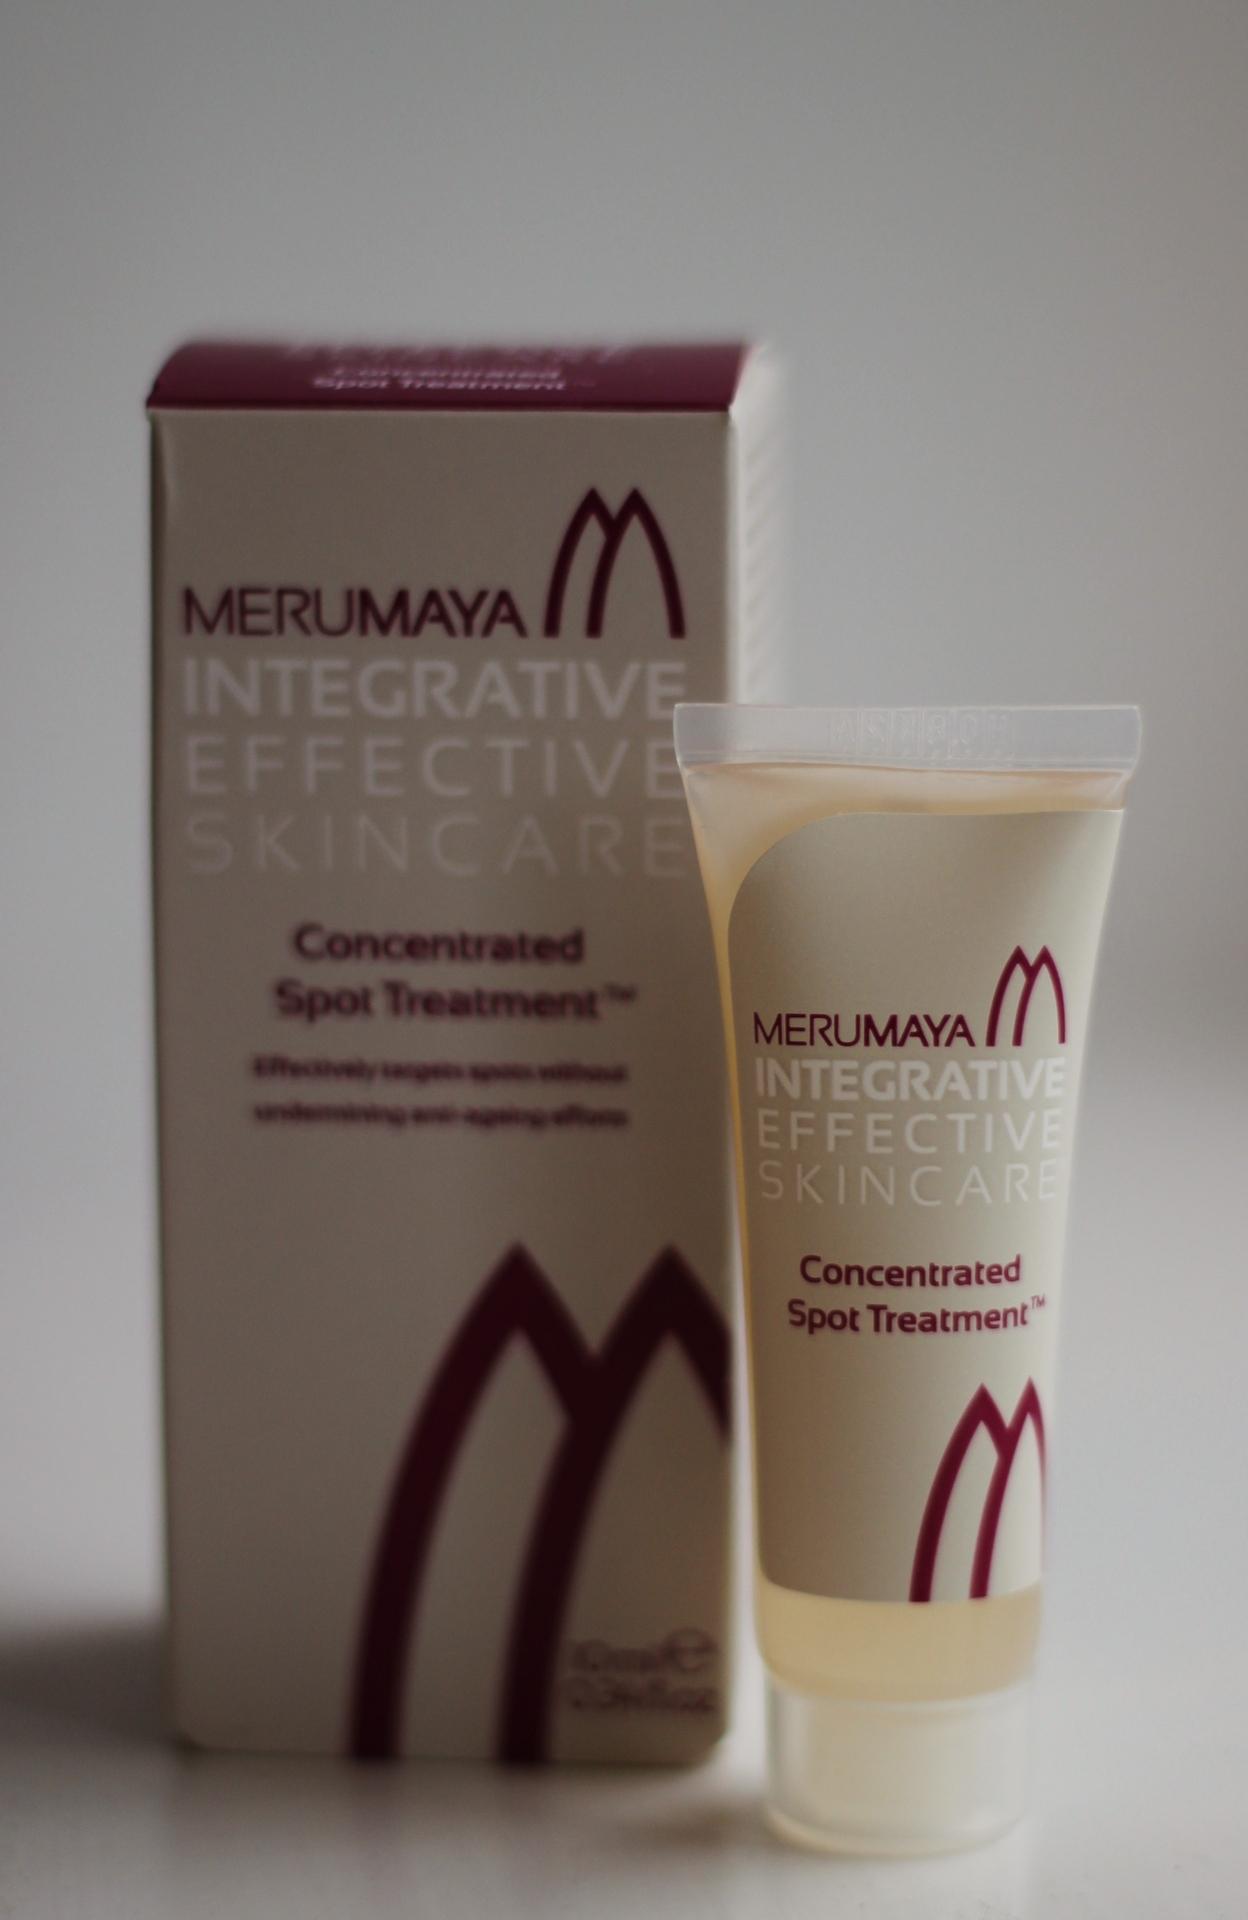 Merumaya Spot treatment